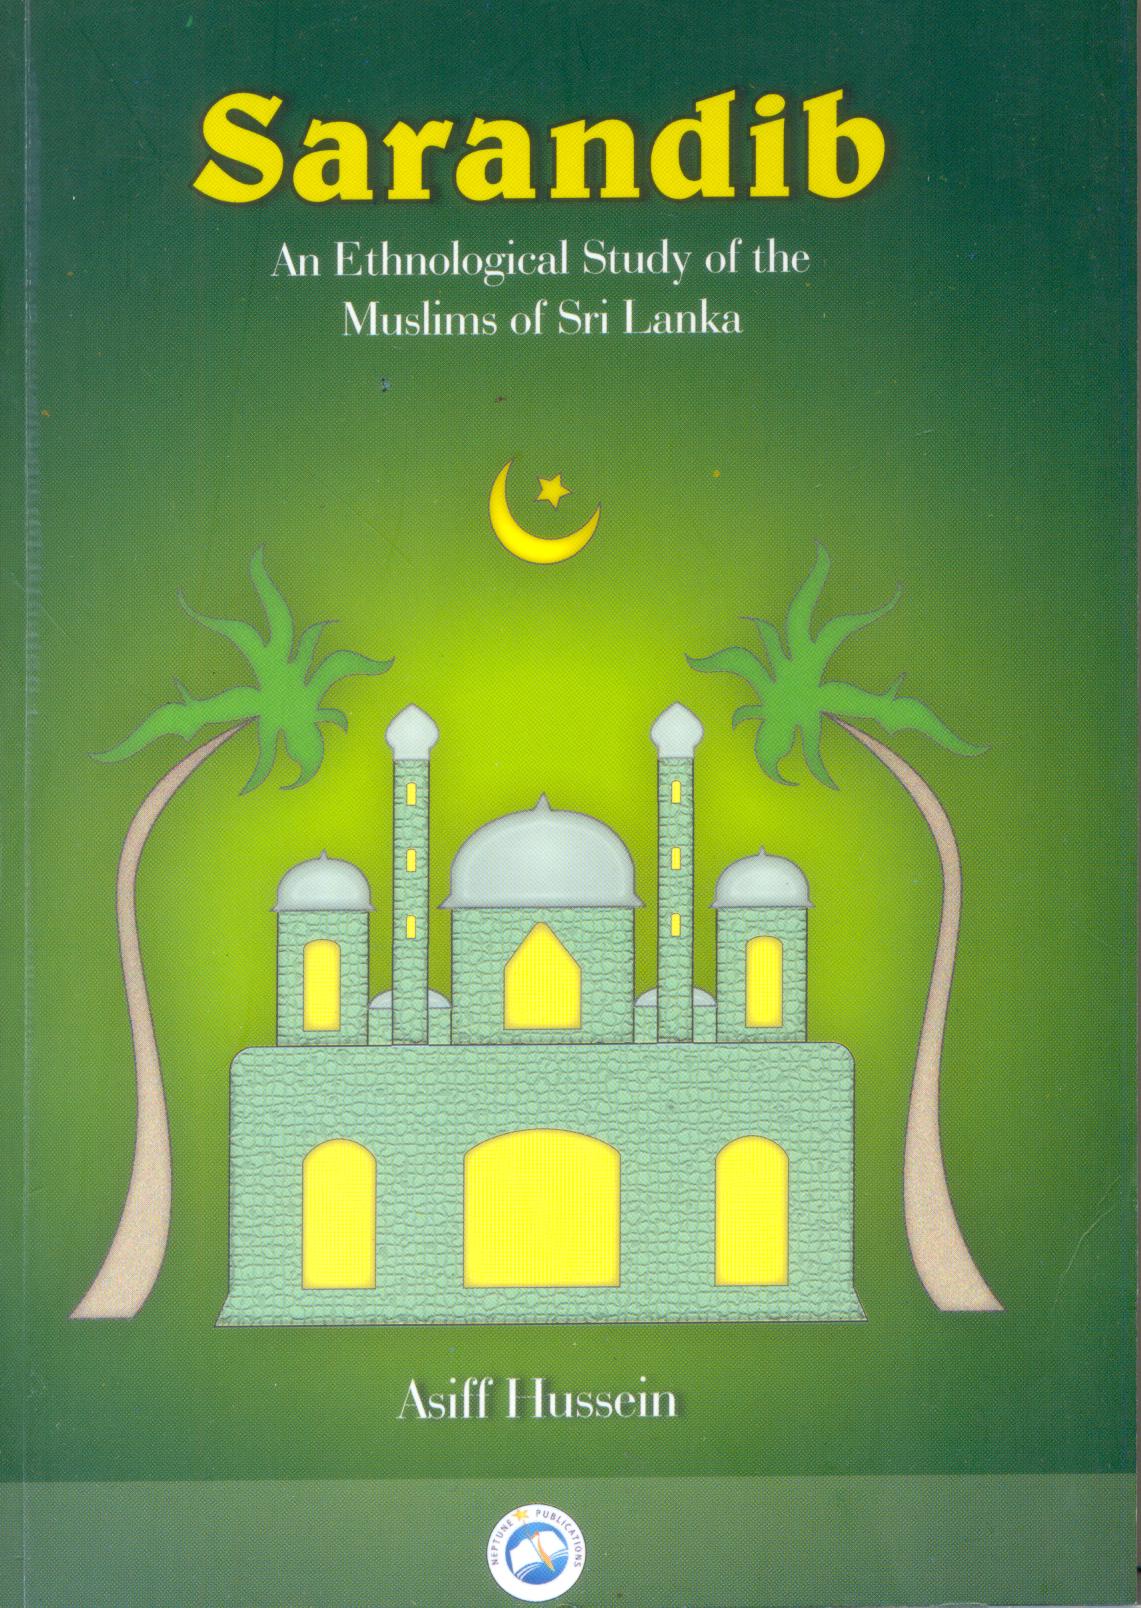 Sarandib (P/B)  - 3rd Ed